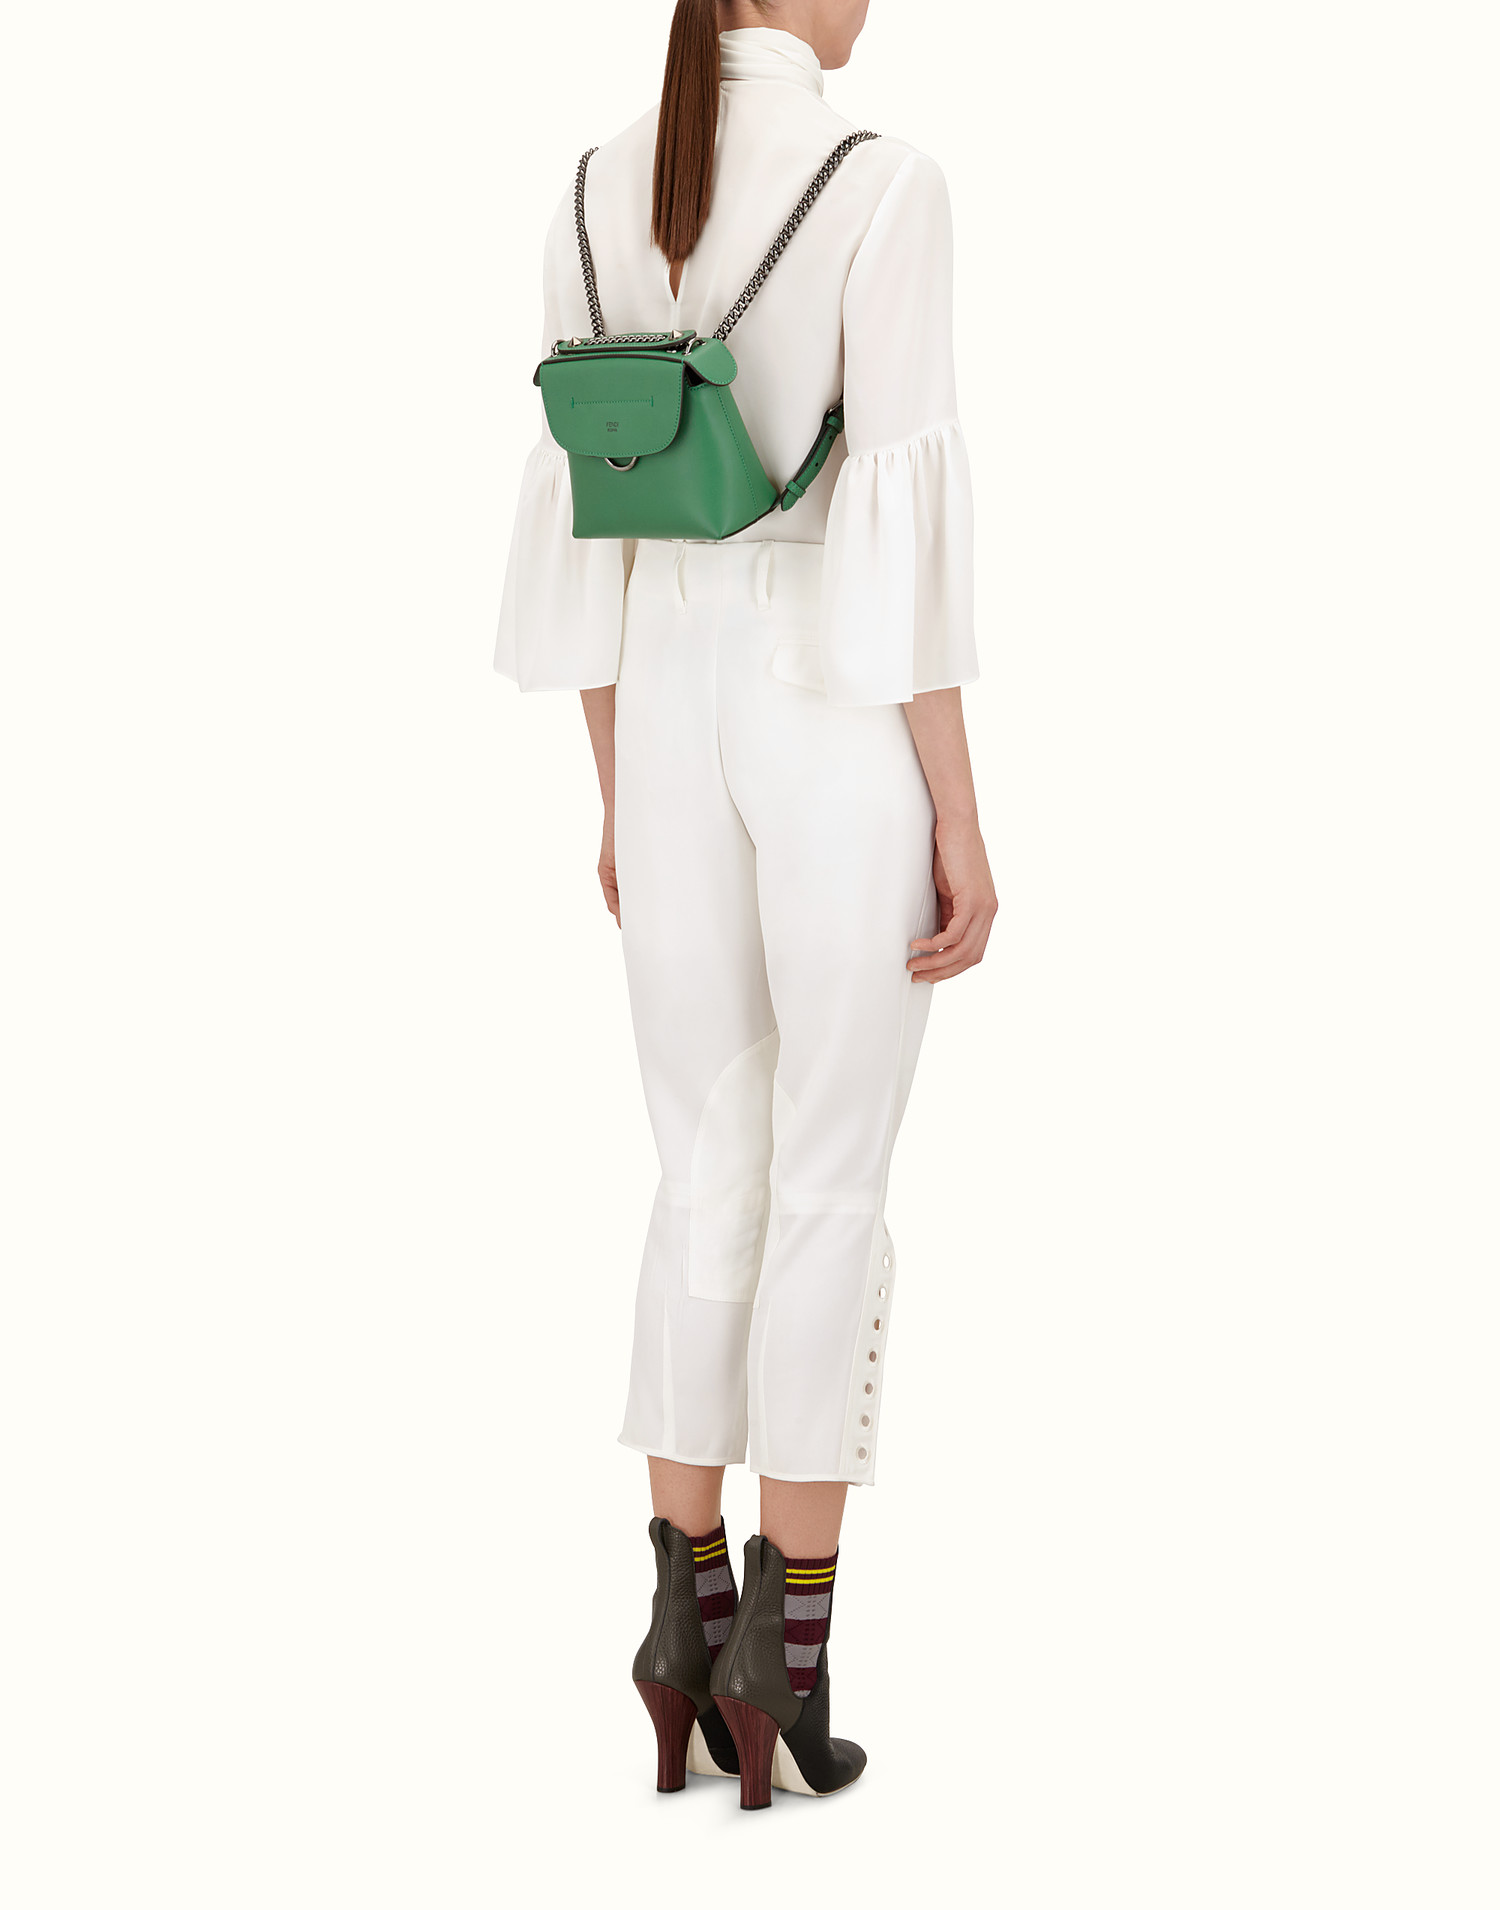 c1dc73d626 Mini backpack in green leather - MINI BACK TO SCHOOL BACKPACK ...